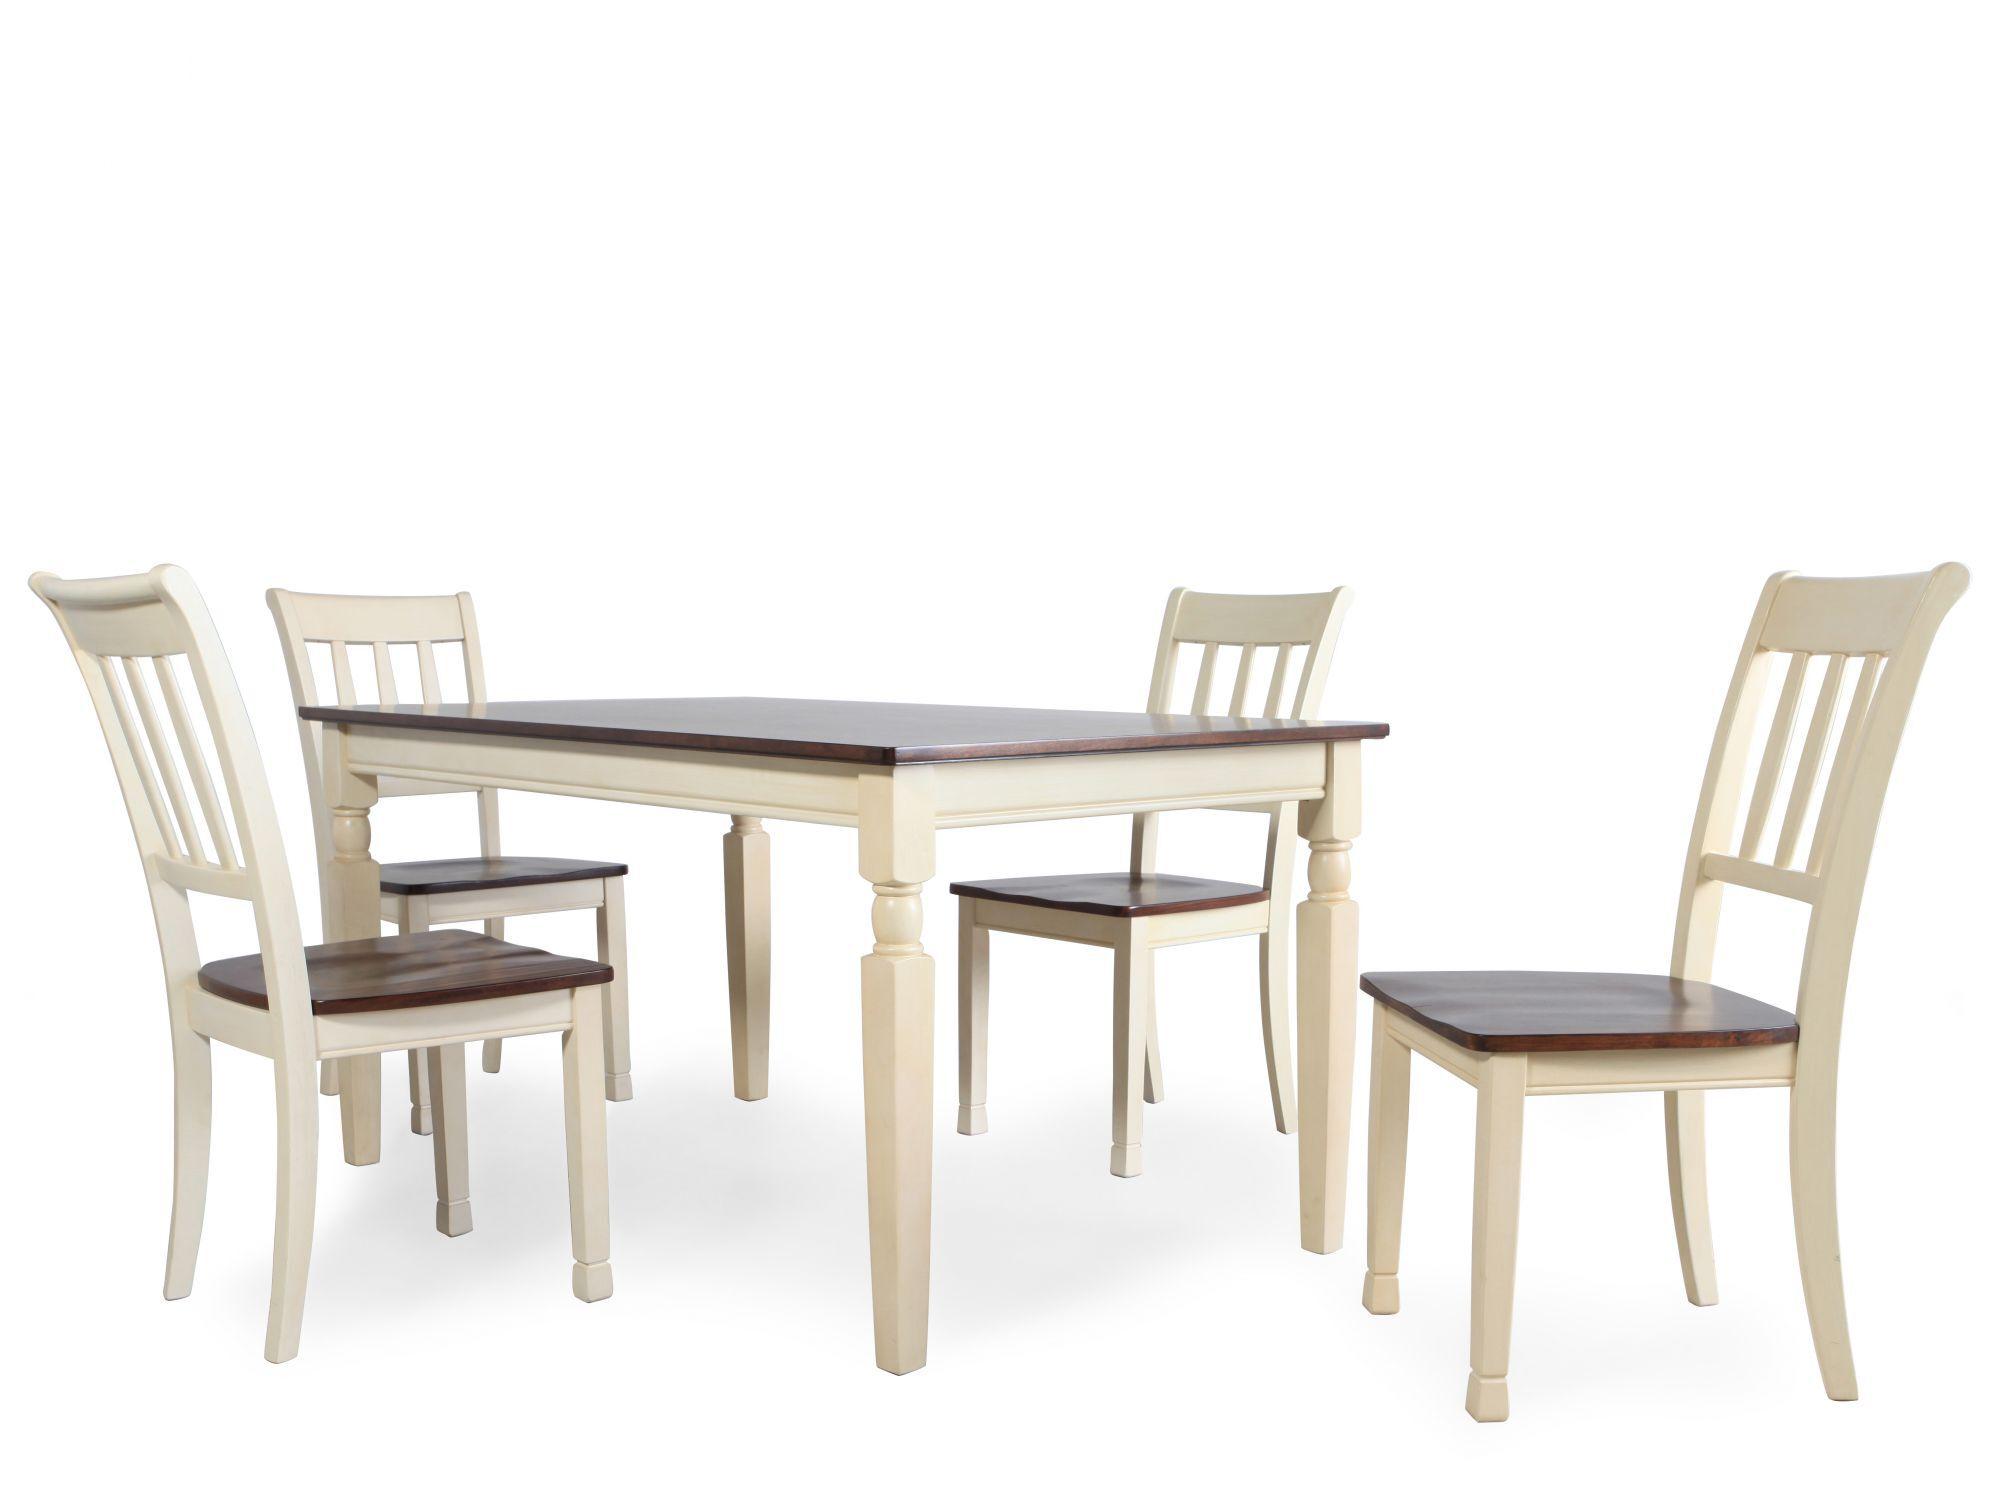 ... Five Piece Cottage Dining Set In Buttermilk. U2039 U203a